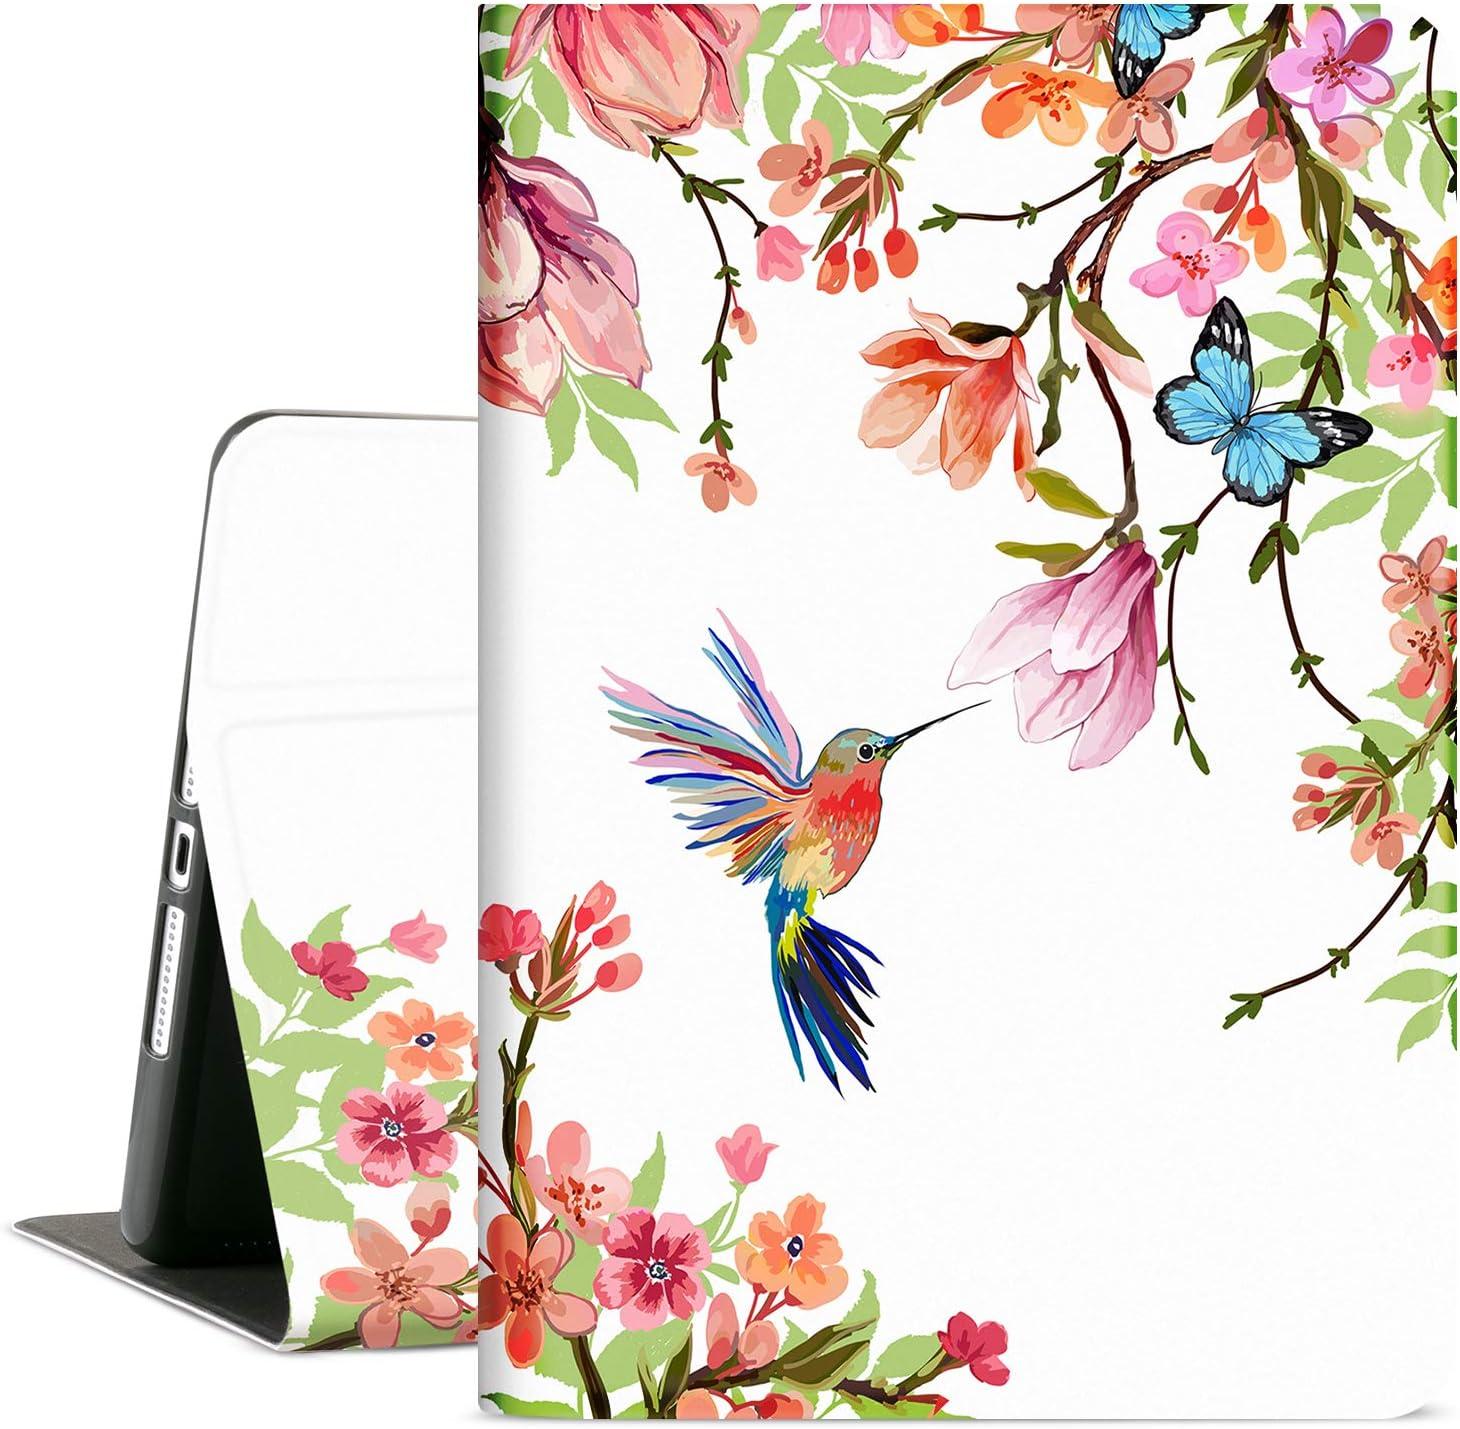 Cutebricase iPad 10.2 Case for iPad 8th Generation 2020, iPad 7th Generation Case 2019 10.2 iPad Cover for Women Girls, Multi-Angle Viewing Case Adjustable Stand Auto Wake / Sleep (Flower Hummingbird)